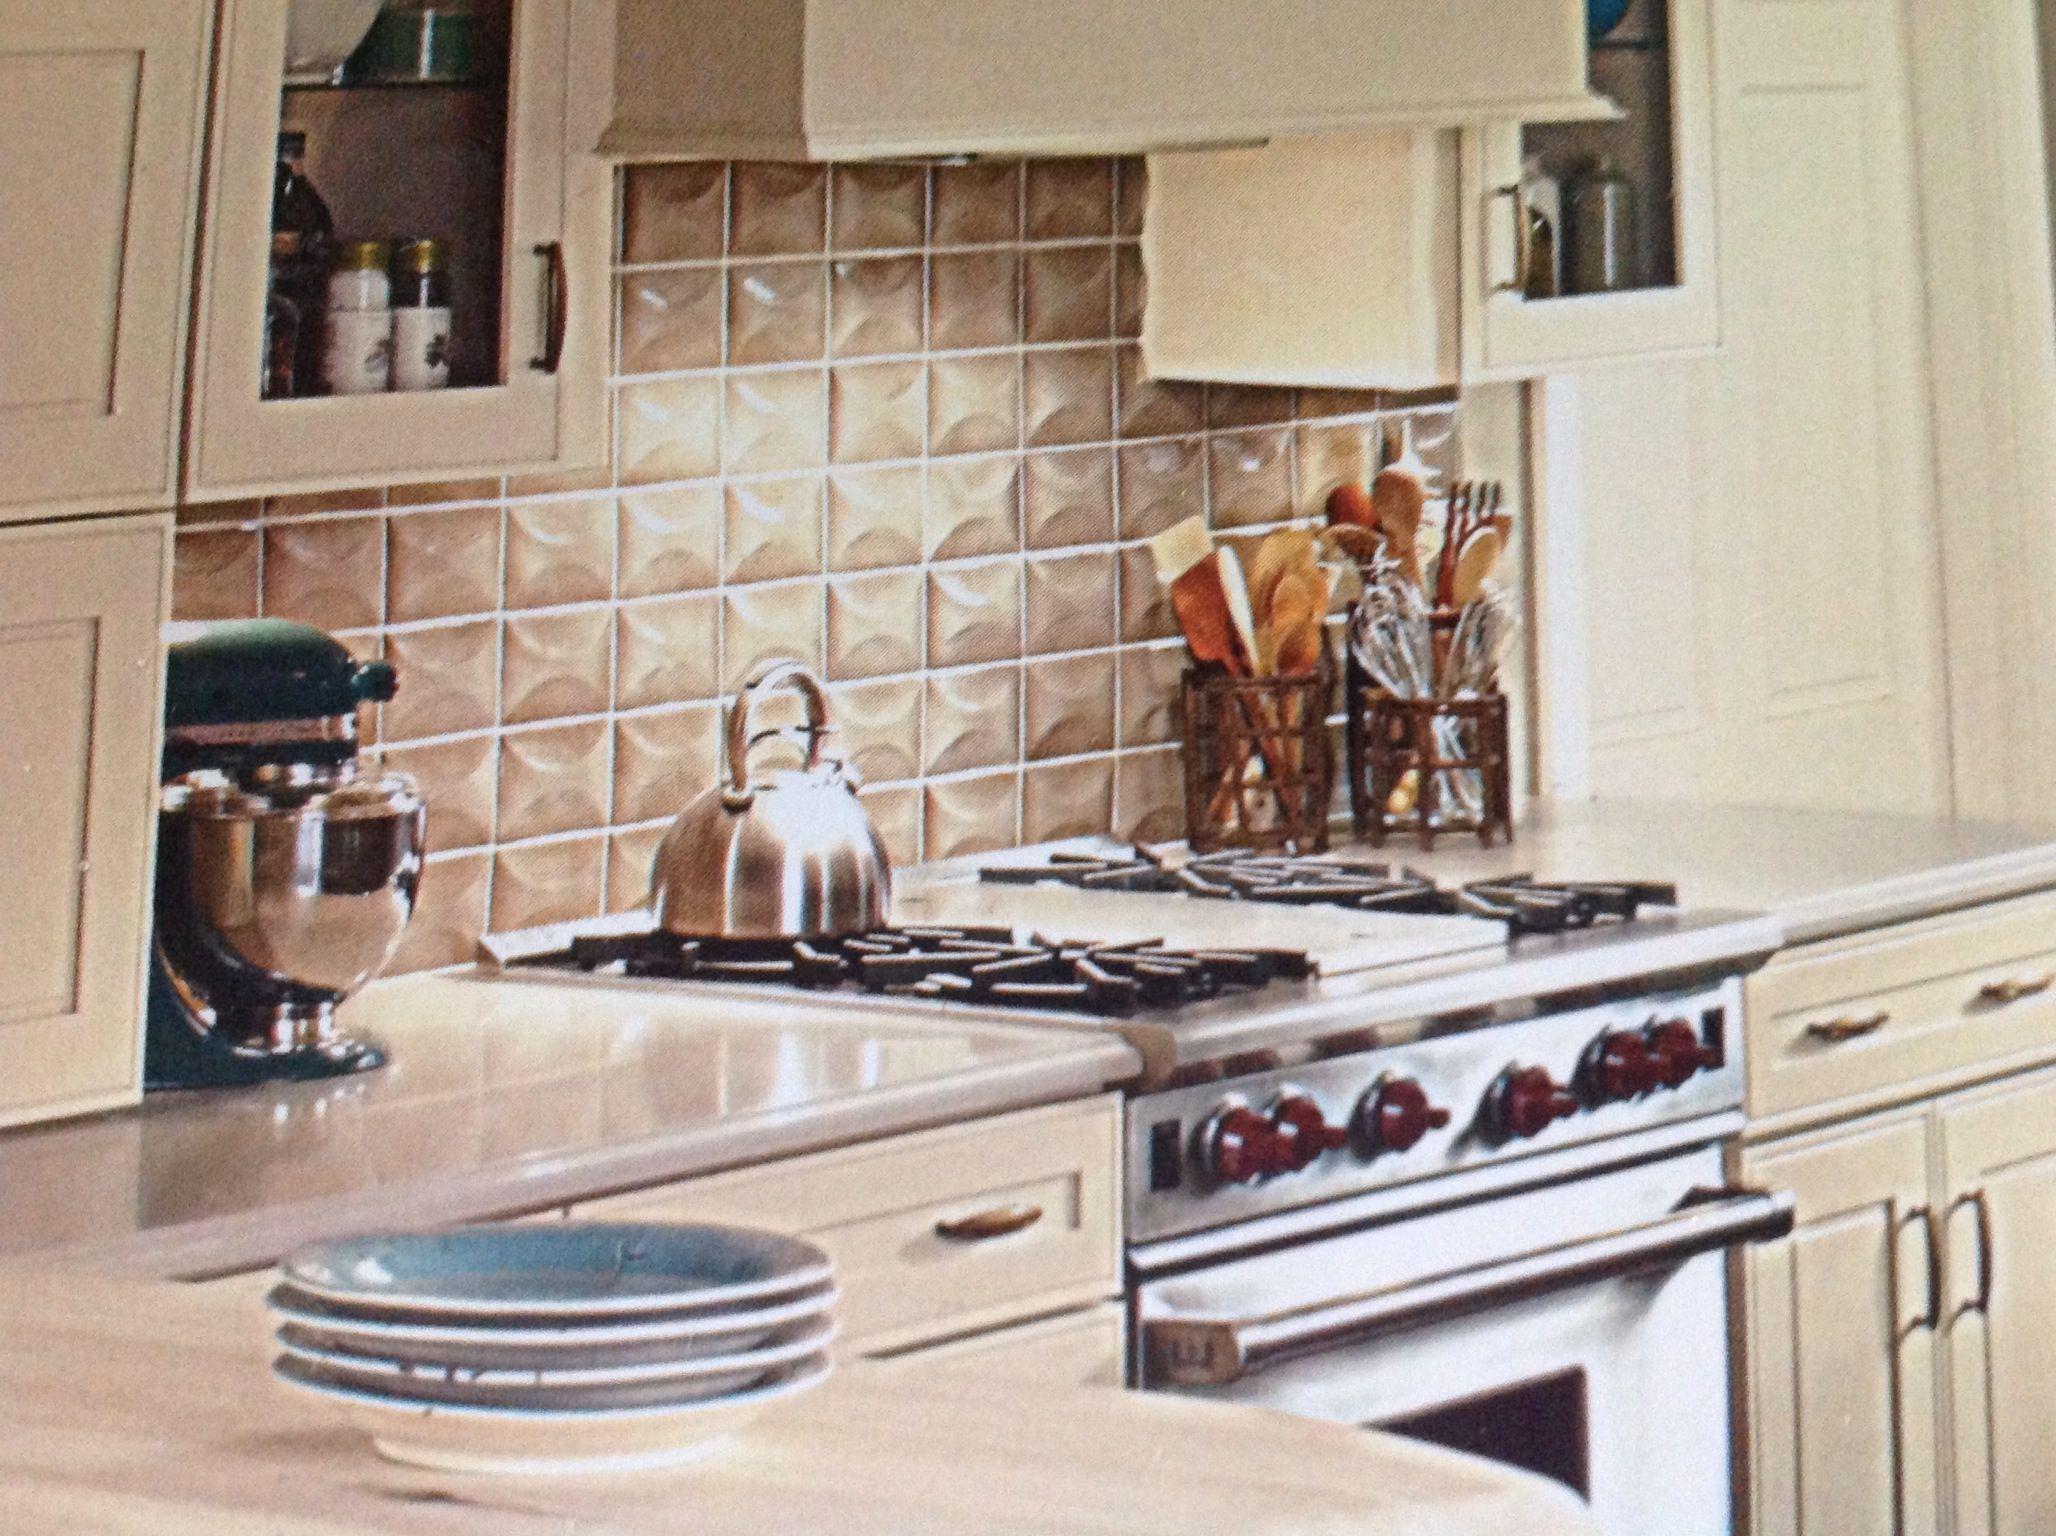 my dream backsplash kitchen reno ideas pinterest